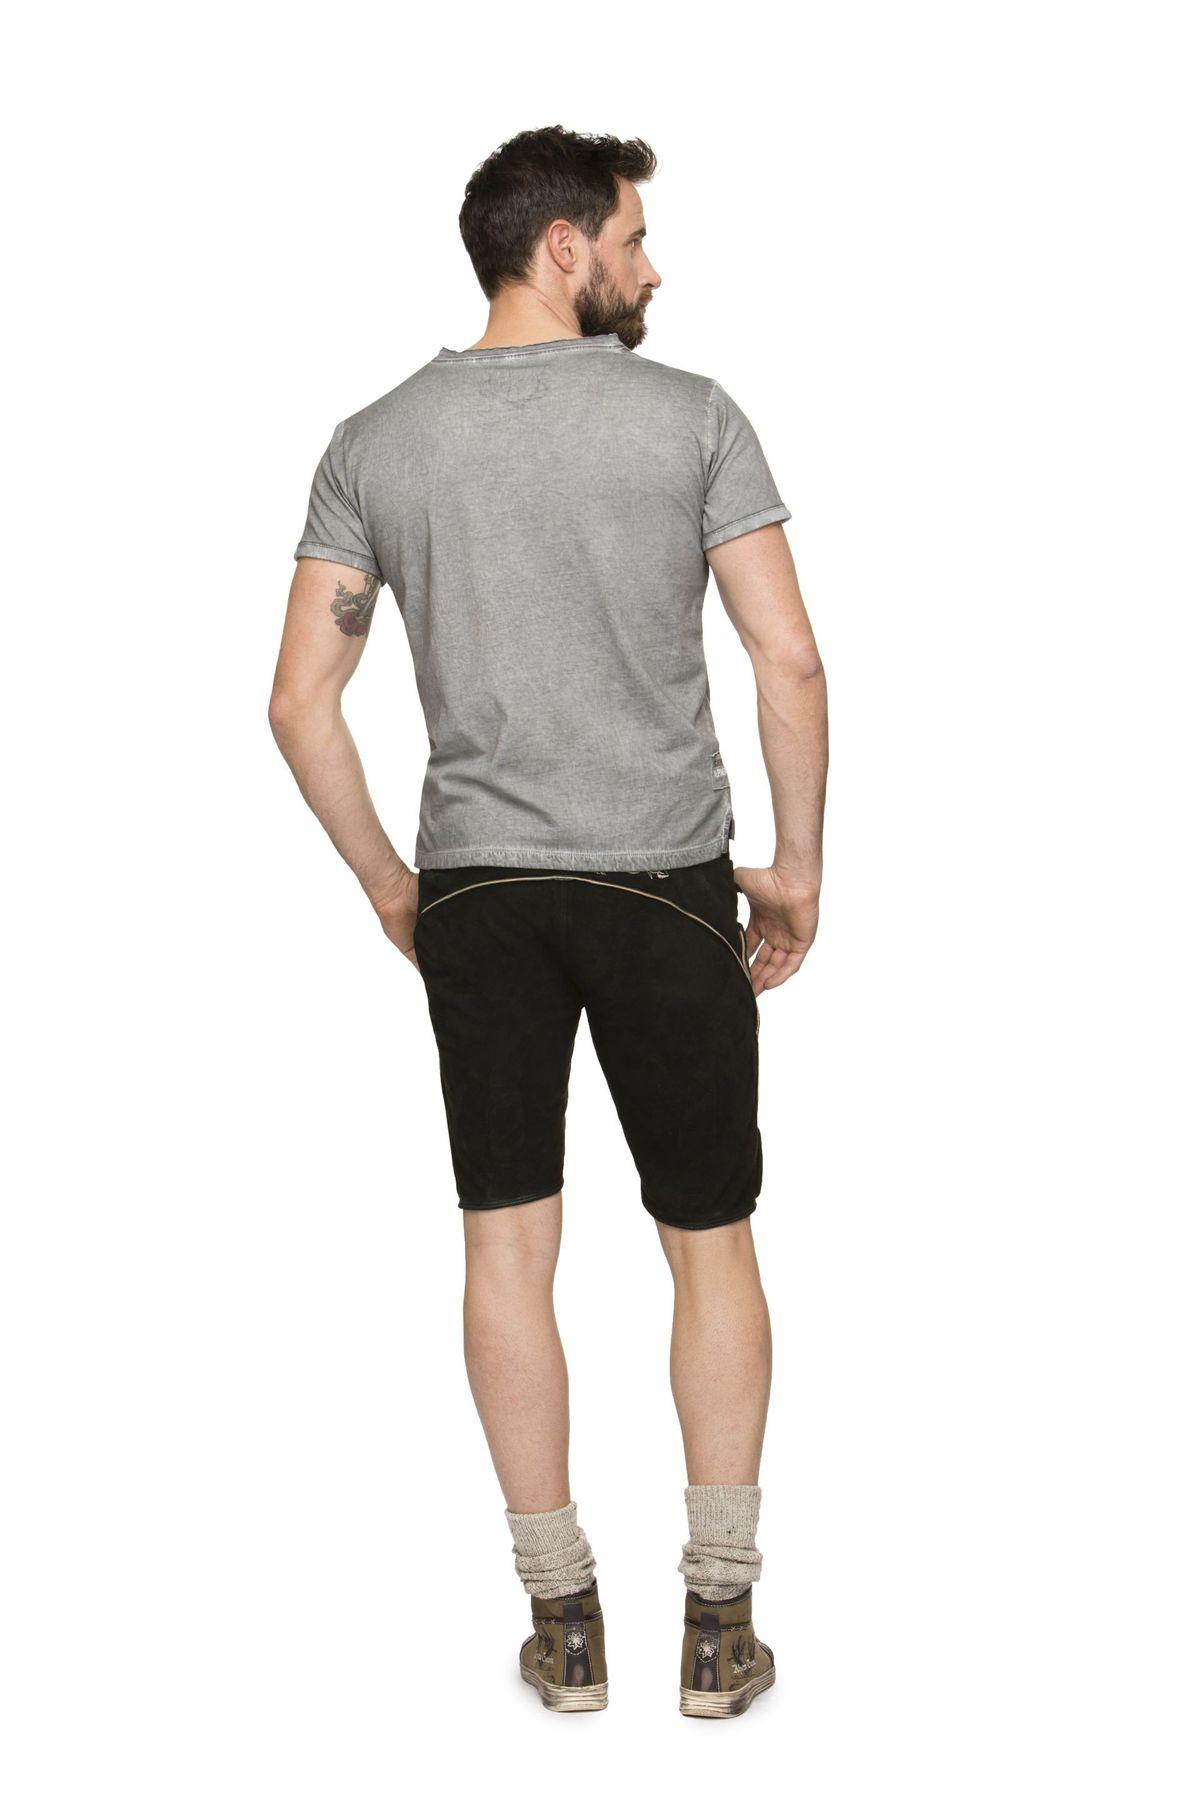 Stockerpoint - Herren Trachten T-Shirt, Oskar – Bild 8